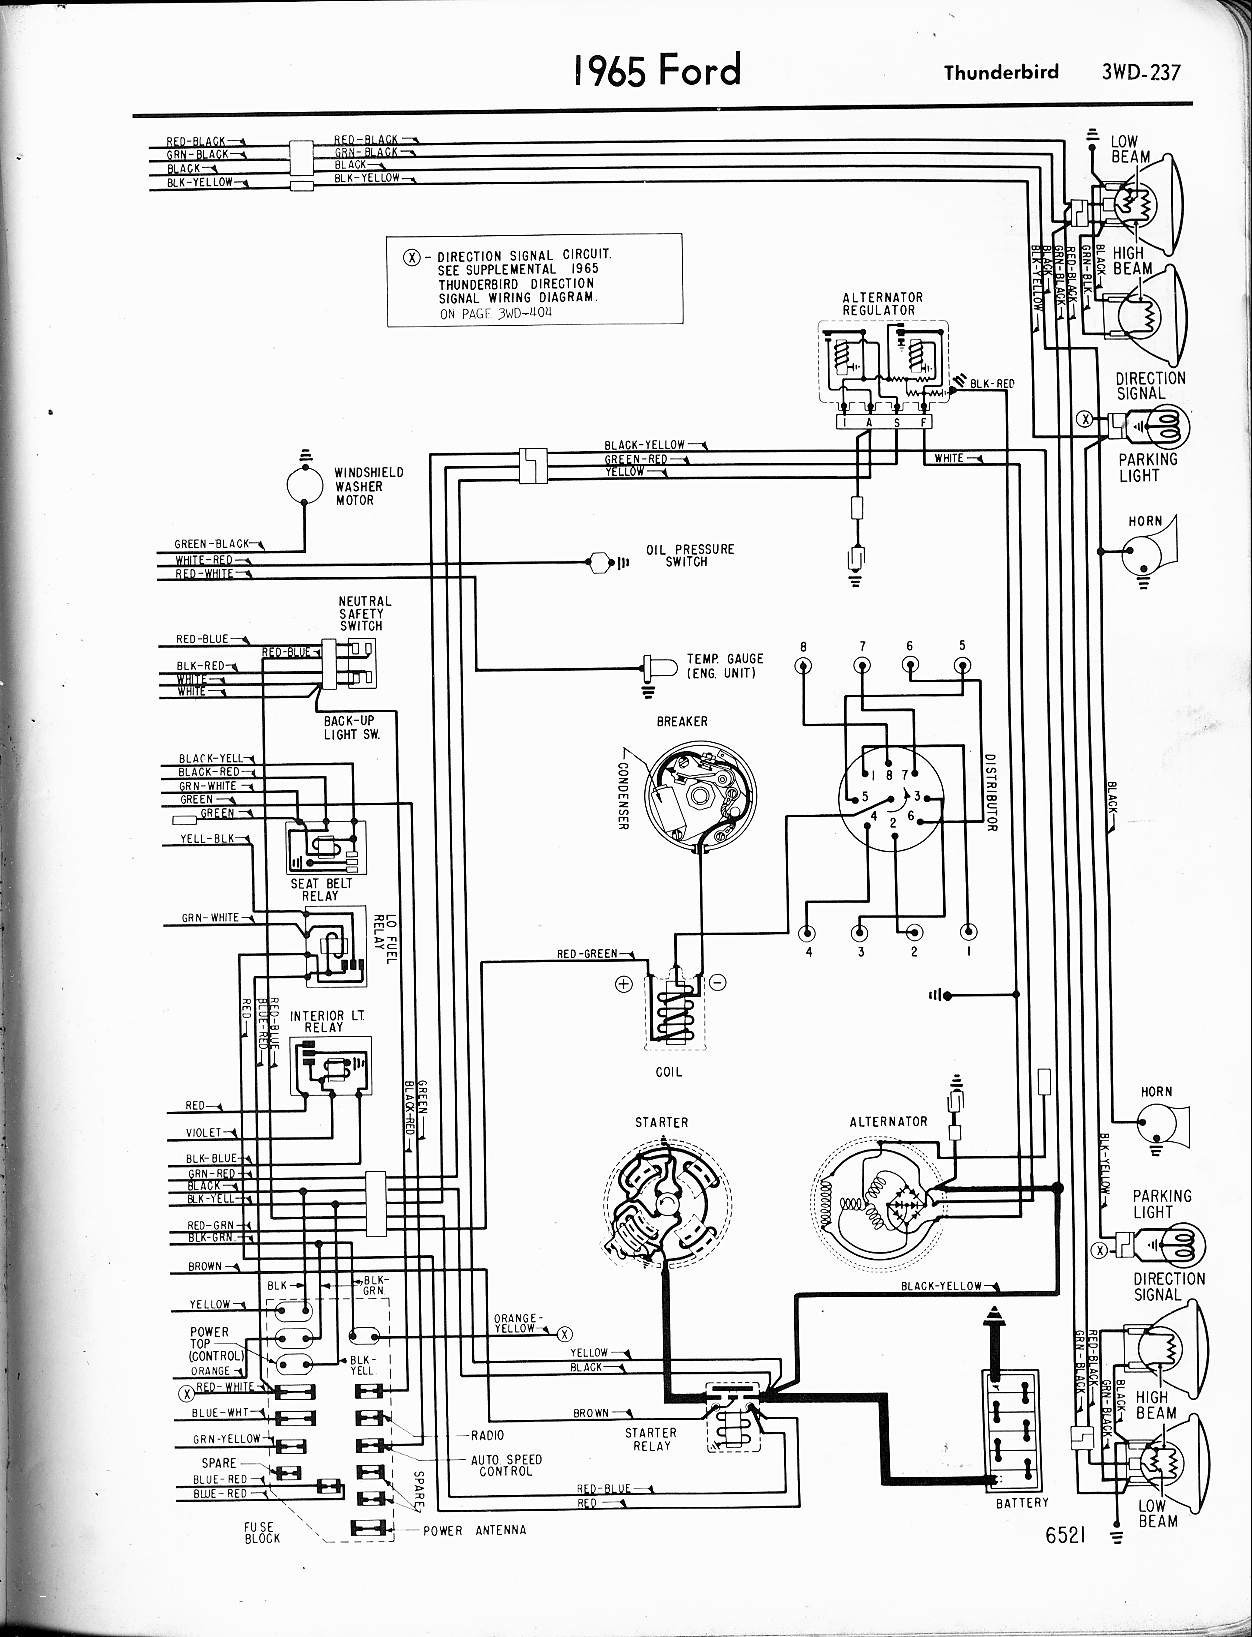 Circuit Diagram Battery Unique Diagram Wiring ford Econoline Wiring Diagram  Alternator Truck Tail